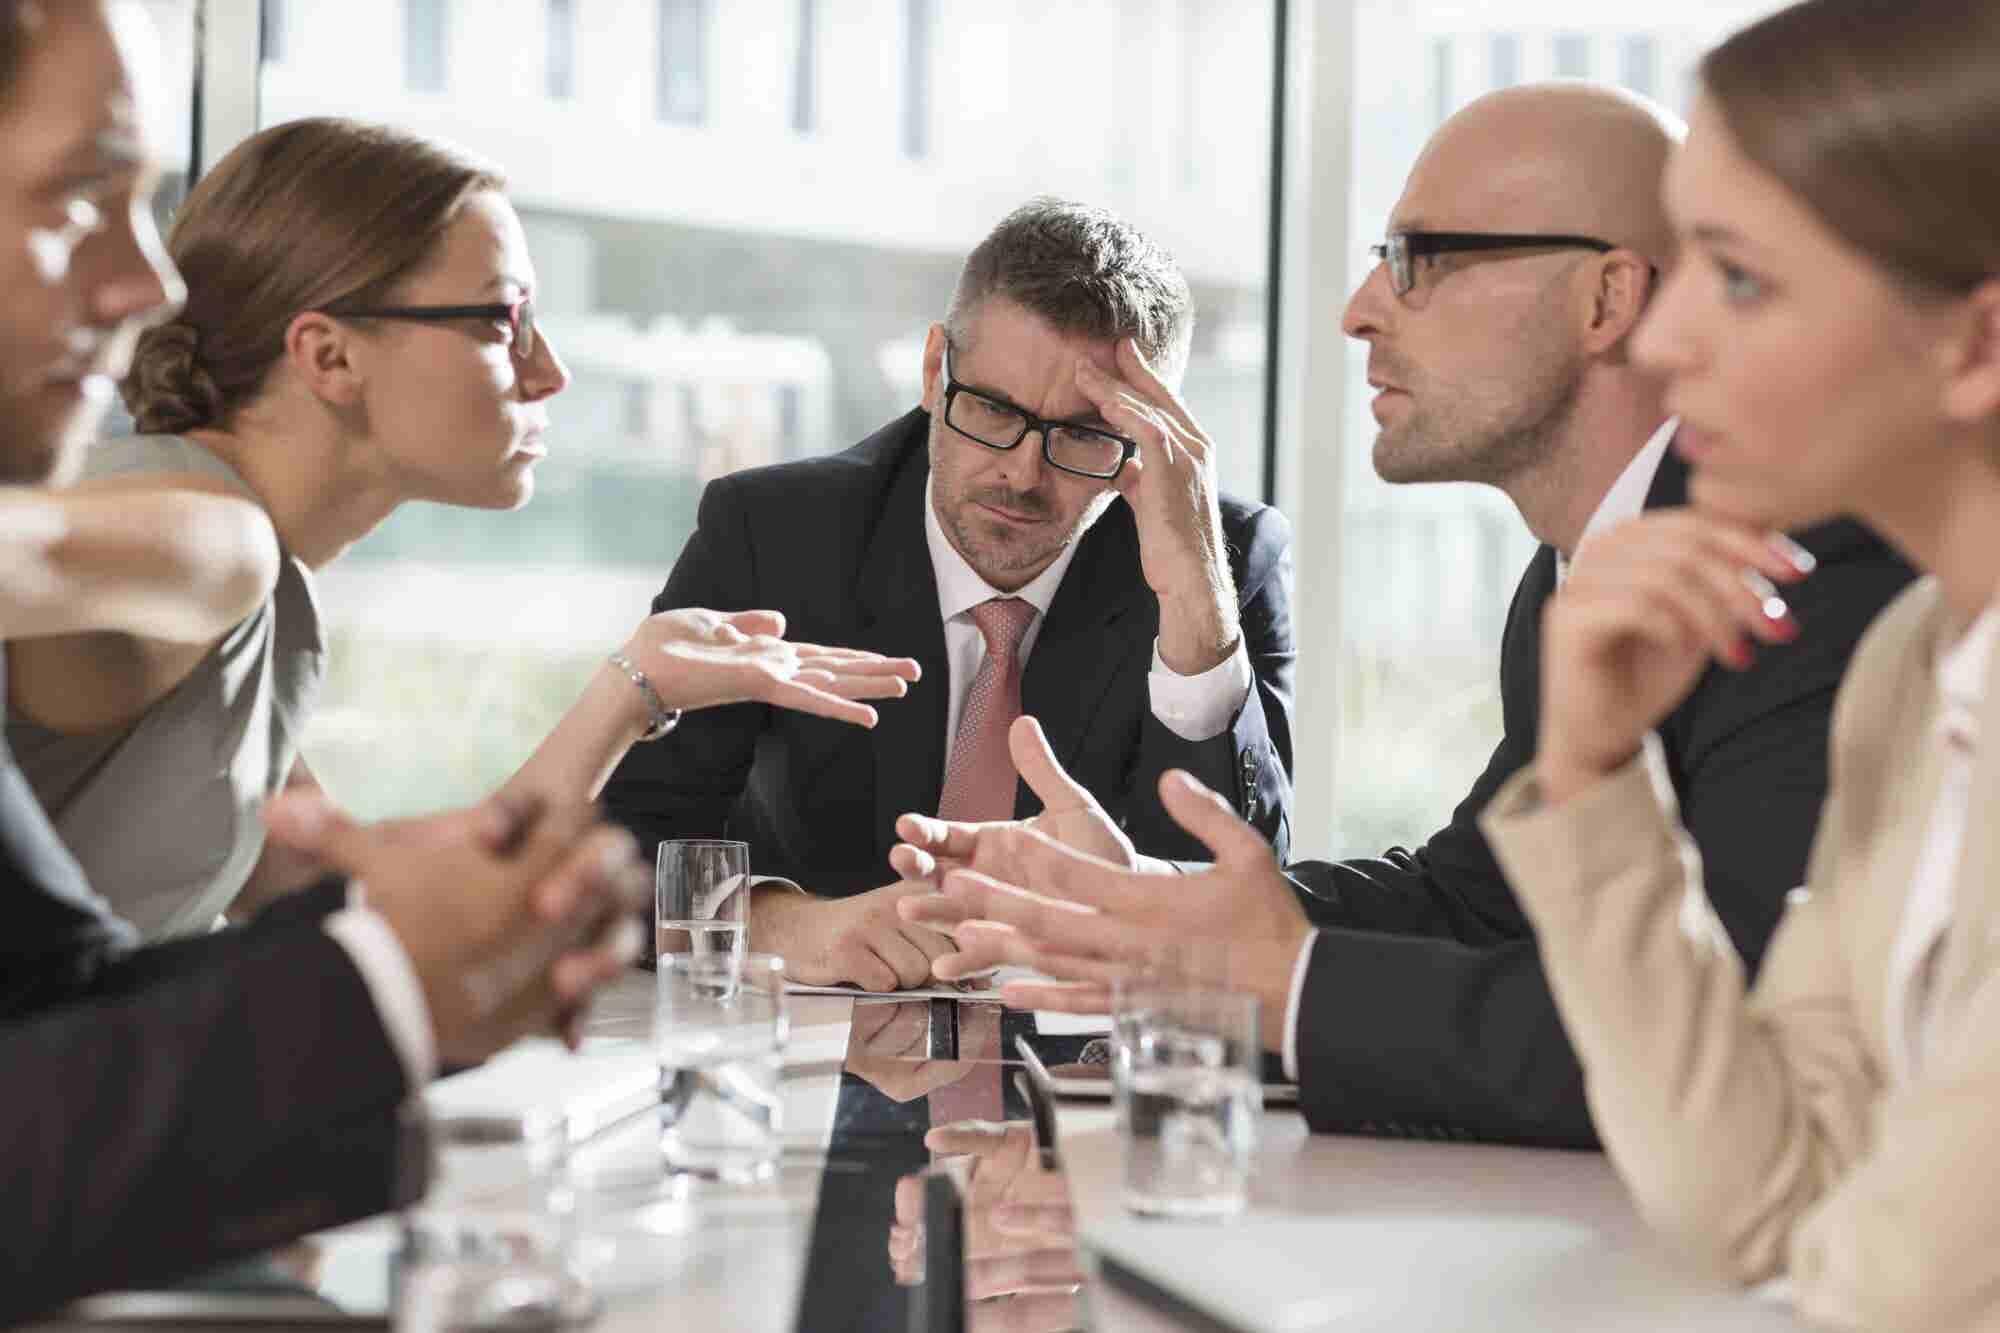 Feeding Into Negativity Won't Grow Your Business